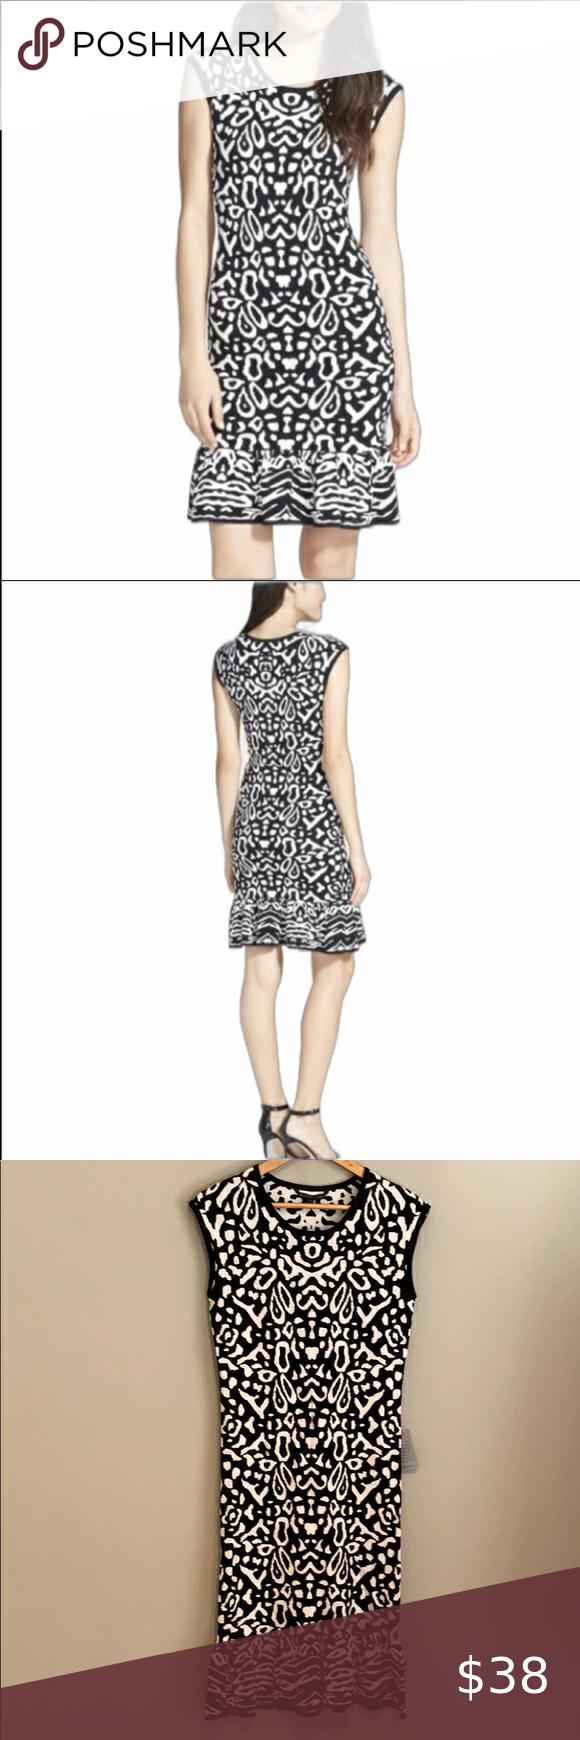 New Felicity Coco Selia Black And White Dress Black N White Dress White Dress Clothes Design [ 1740 x 580 Pixel ]